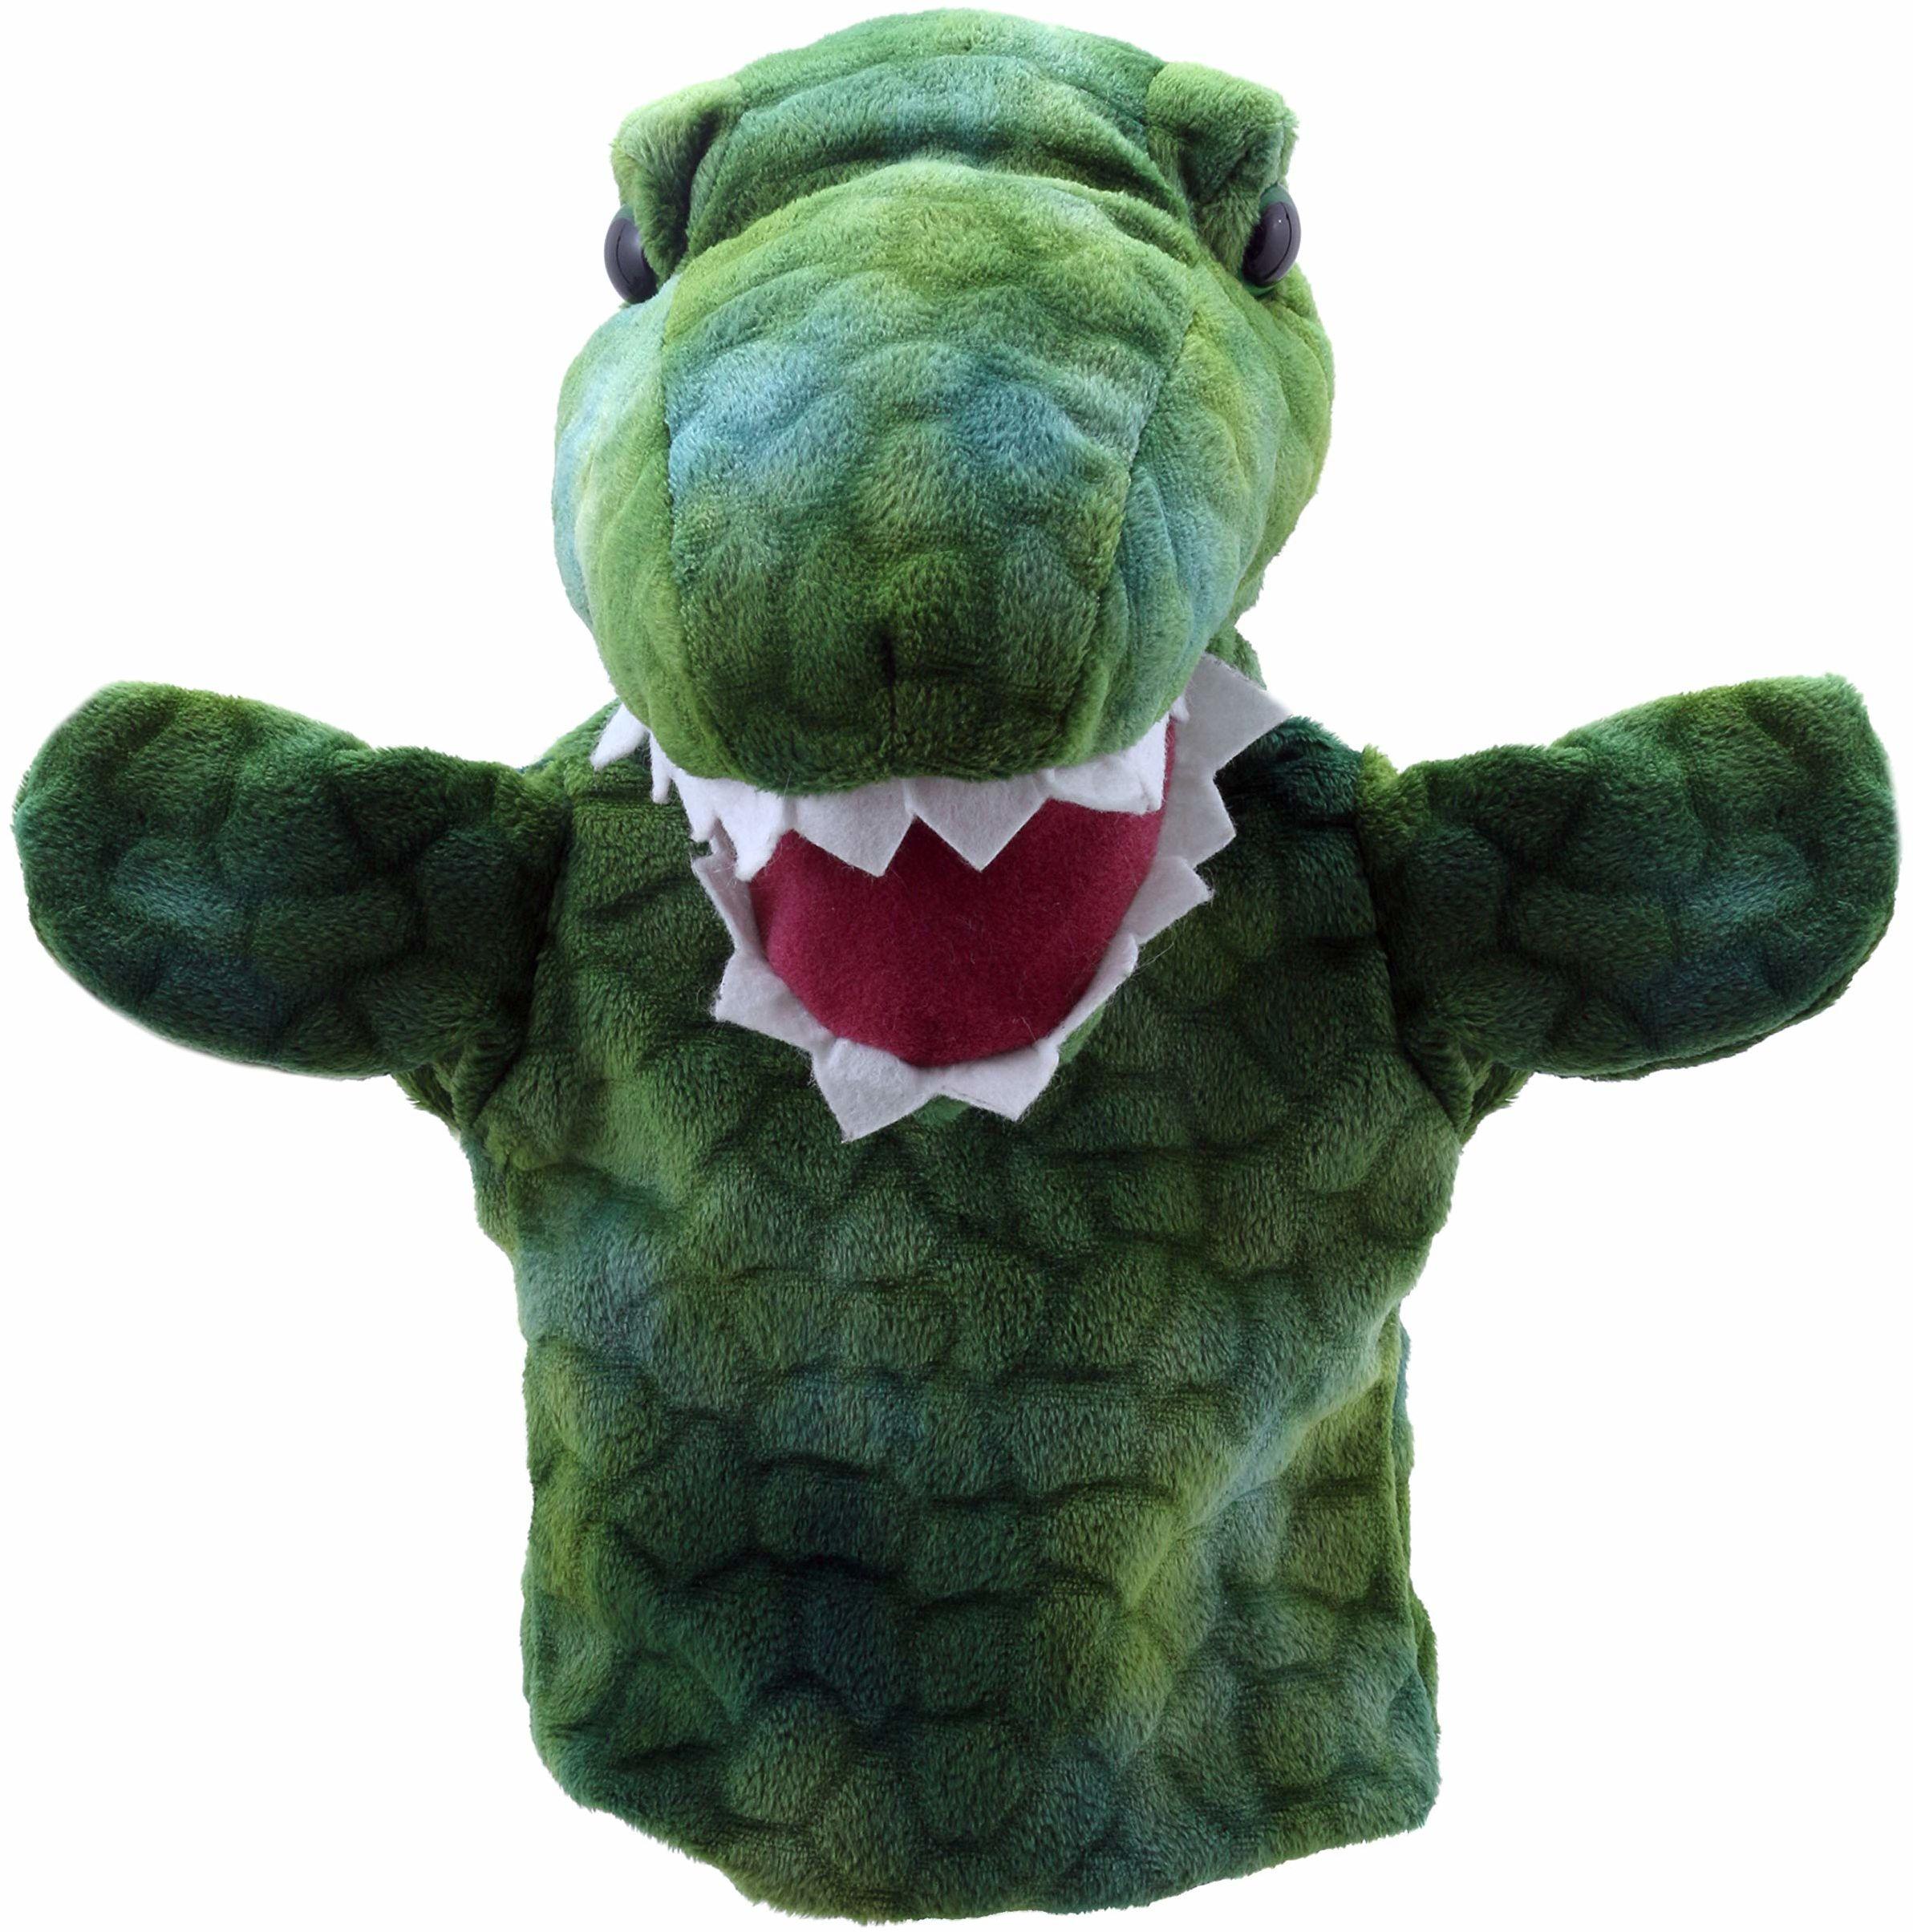 The Puppet Company Puppet Buddies T-Rex lalka, PC004636